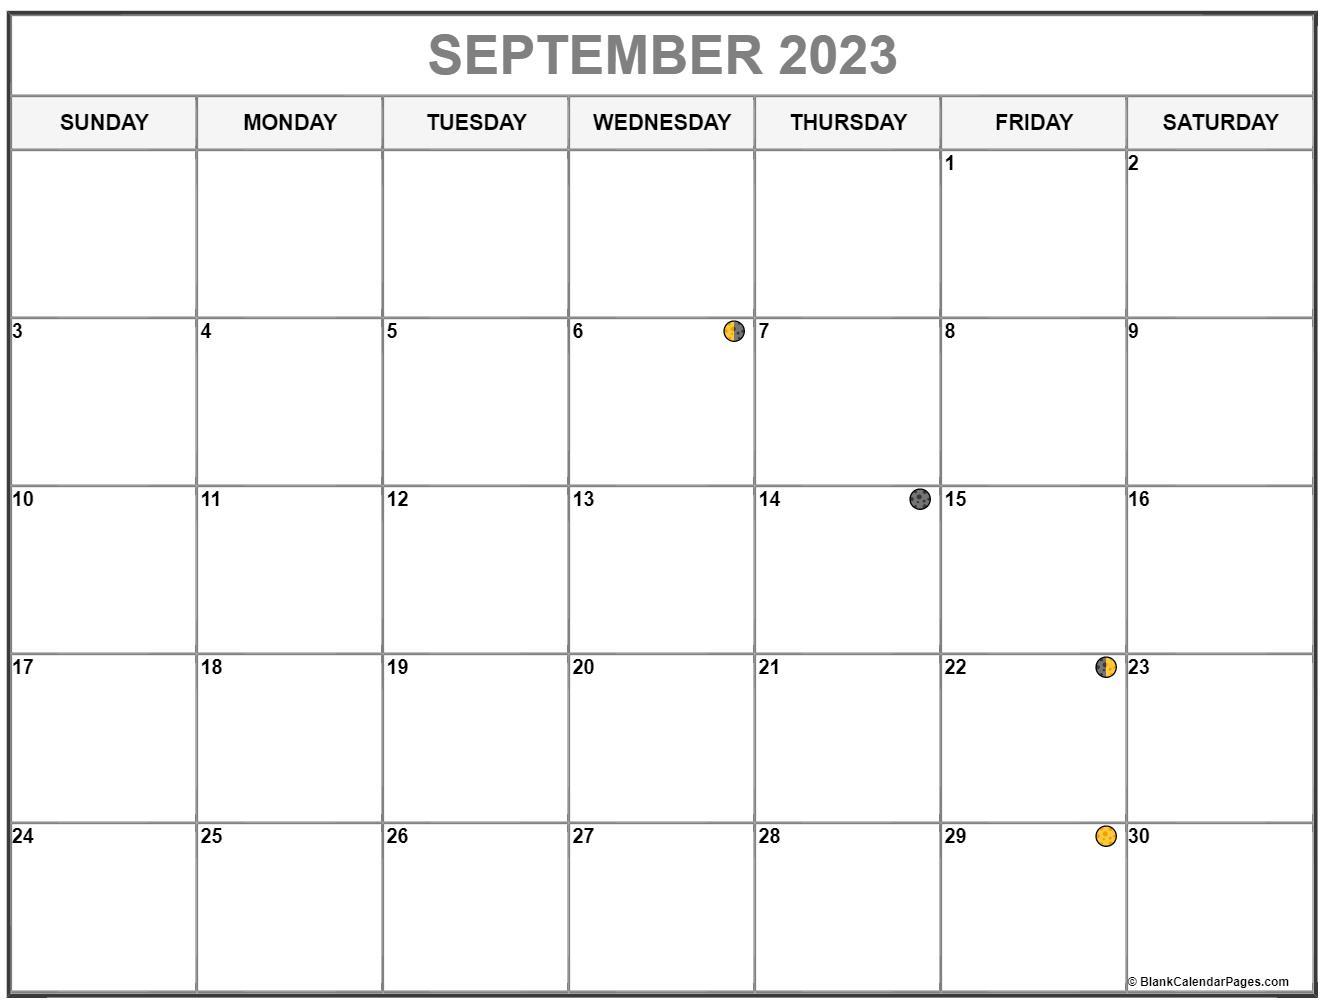 September 2022 Lunar Calendar | Moon Phase Calendar